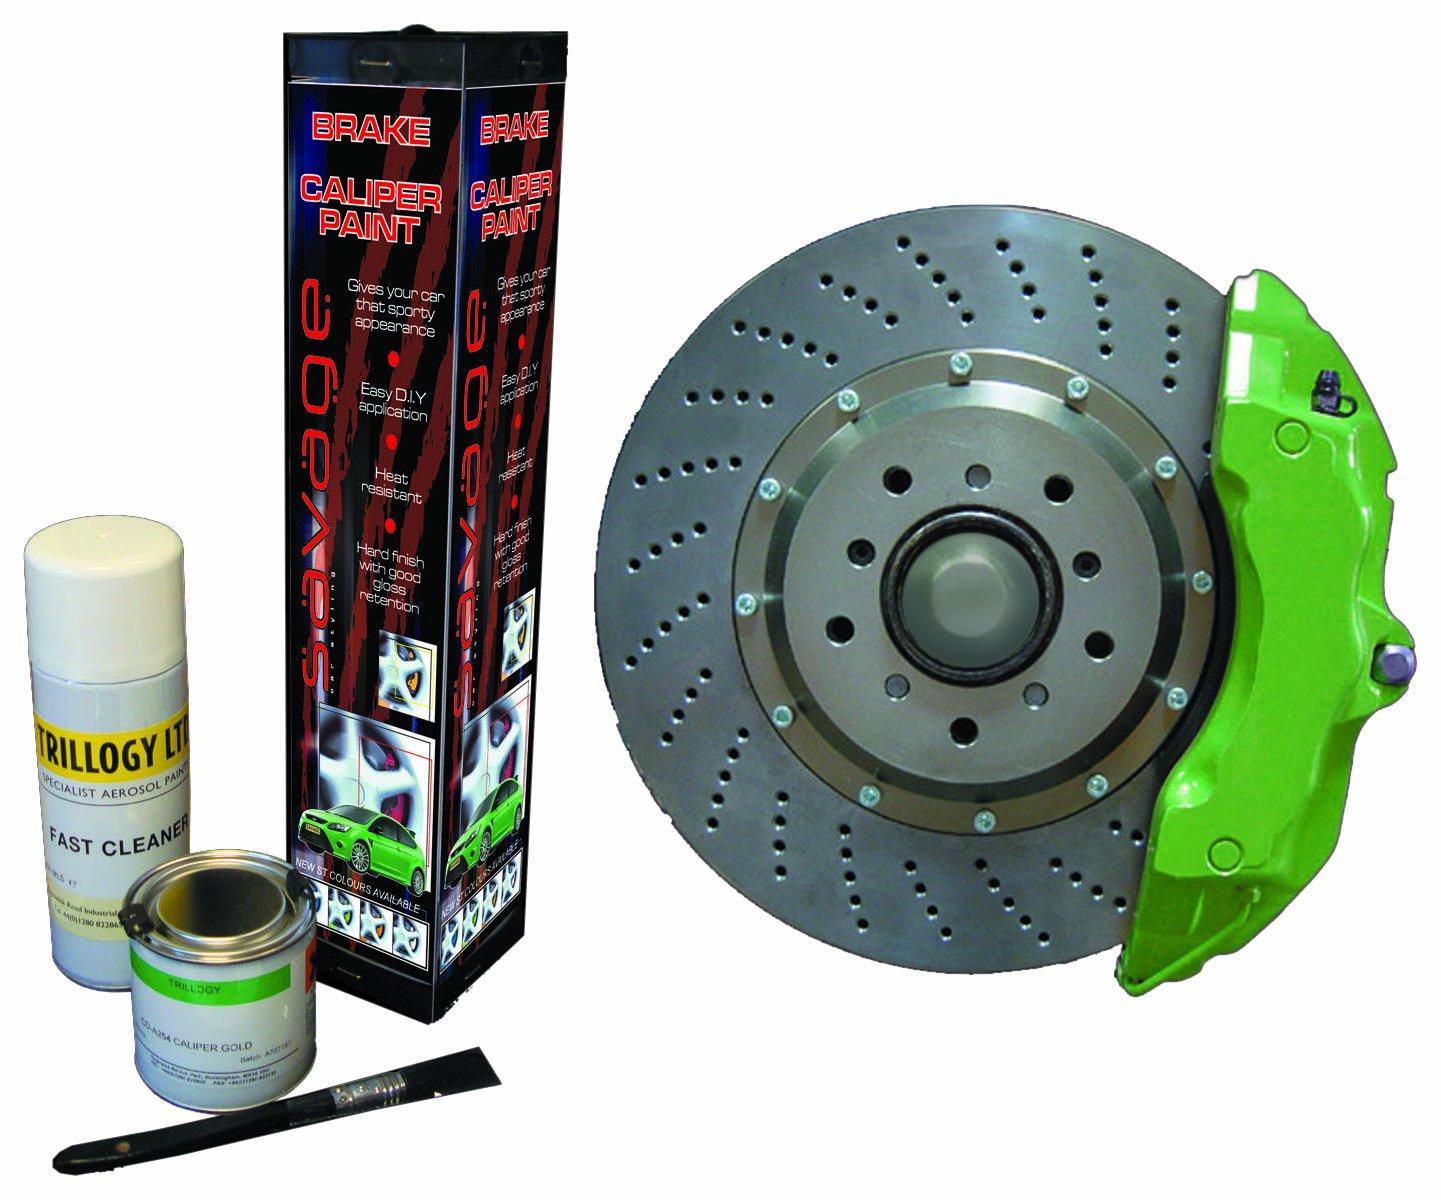 Caliper paint chop whatcha think page 2 mustangforums com - Savage A256 Brake Caliper Paint 250ml Green Amazon Co Uk Car Motorbike